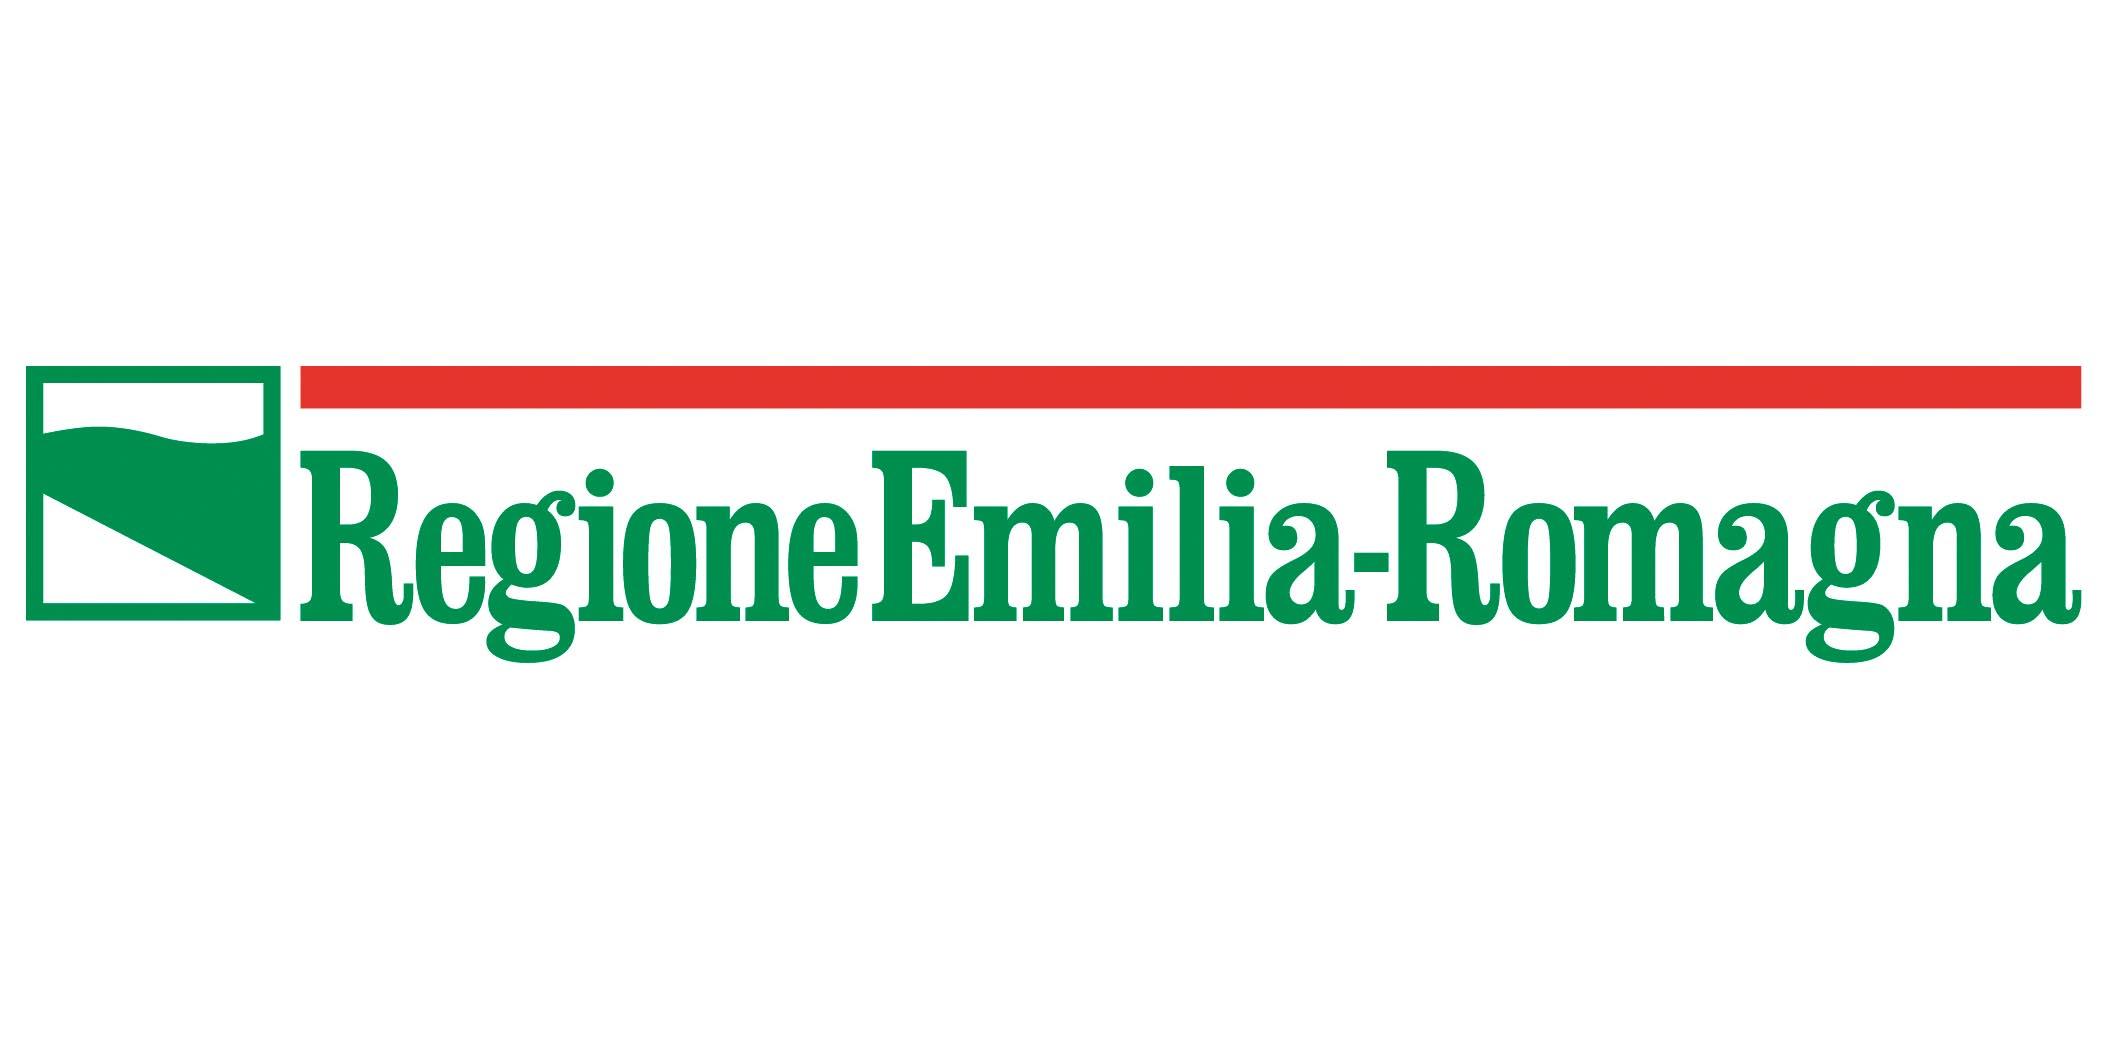 Risultati immagini per logo regione emilia romagna